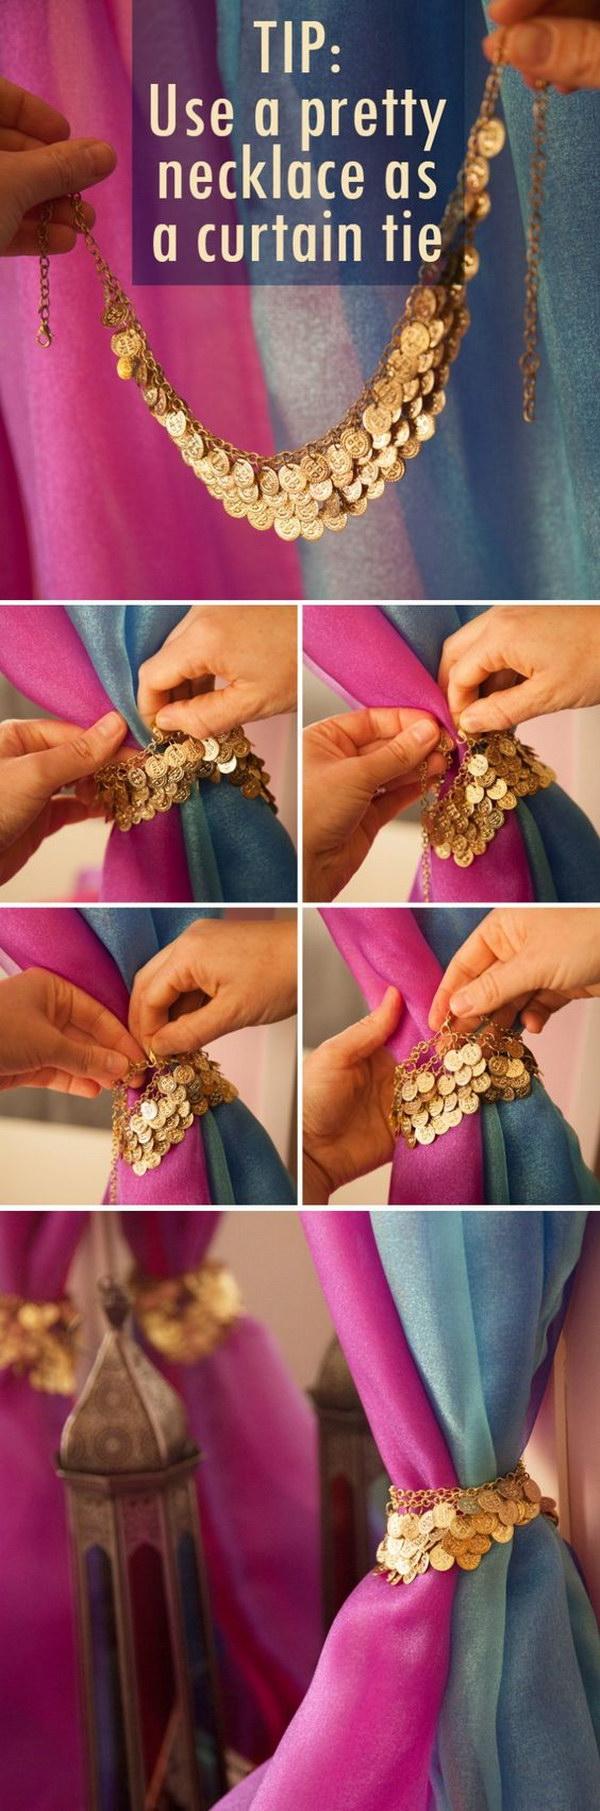 DIY Dresser Mirror Curtain With A Pretty Necklace.